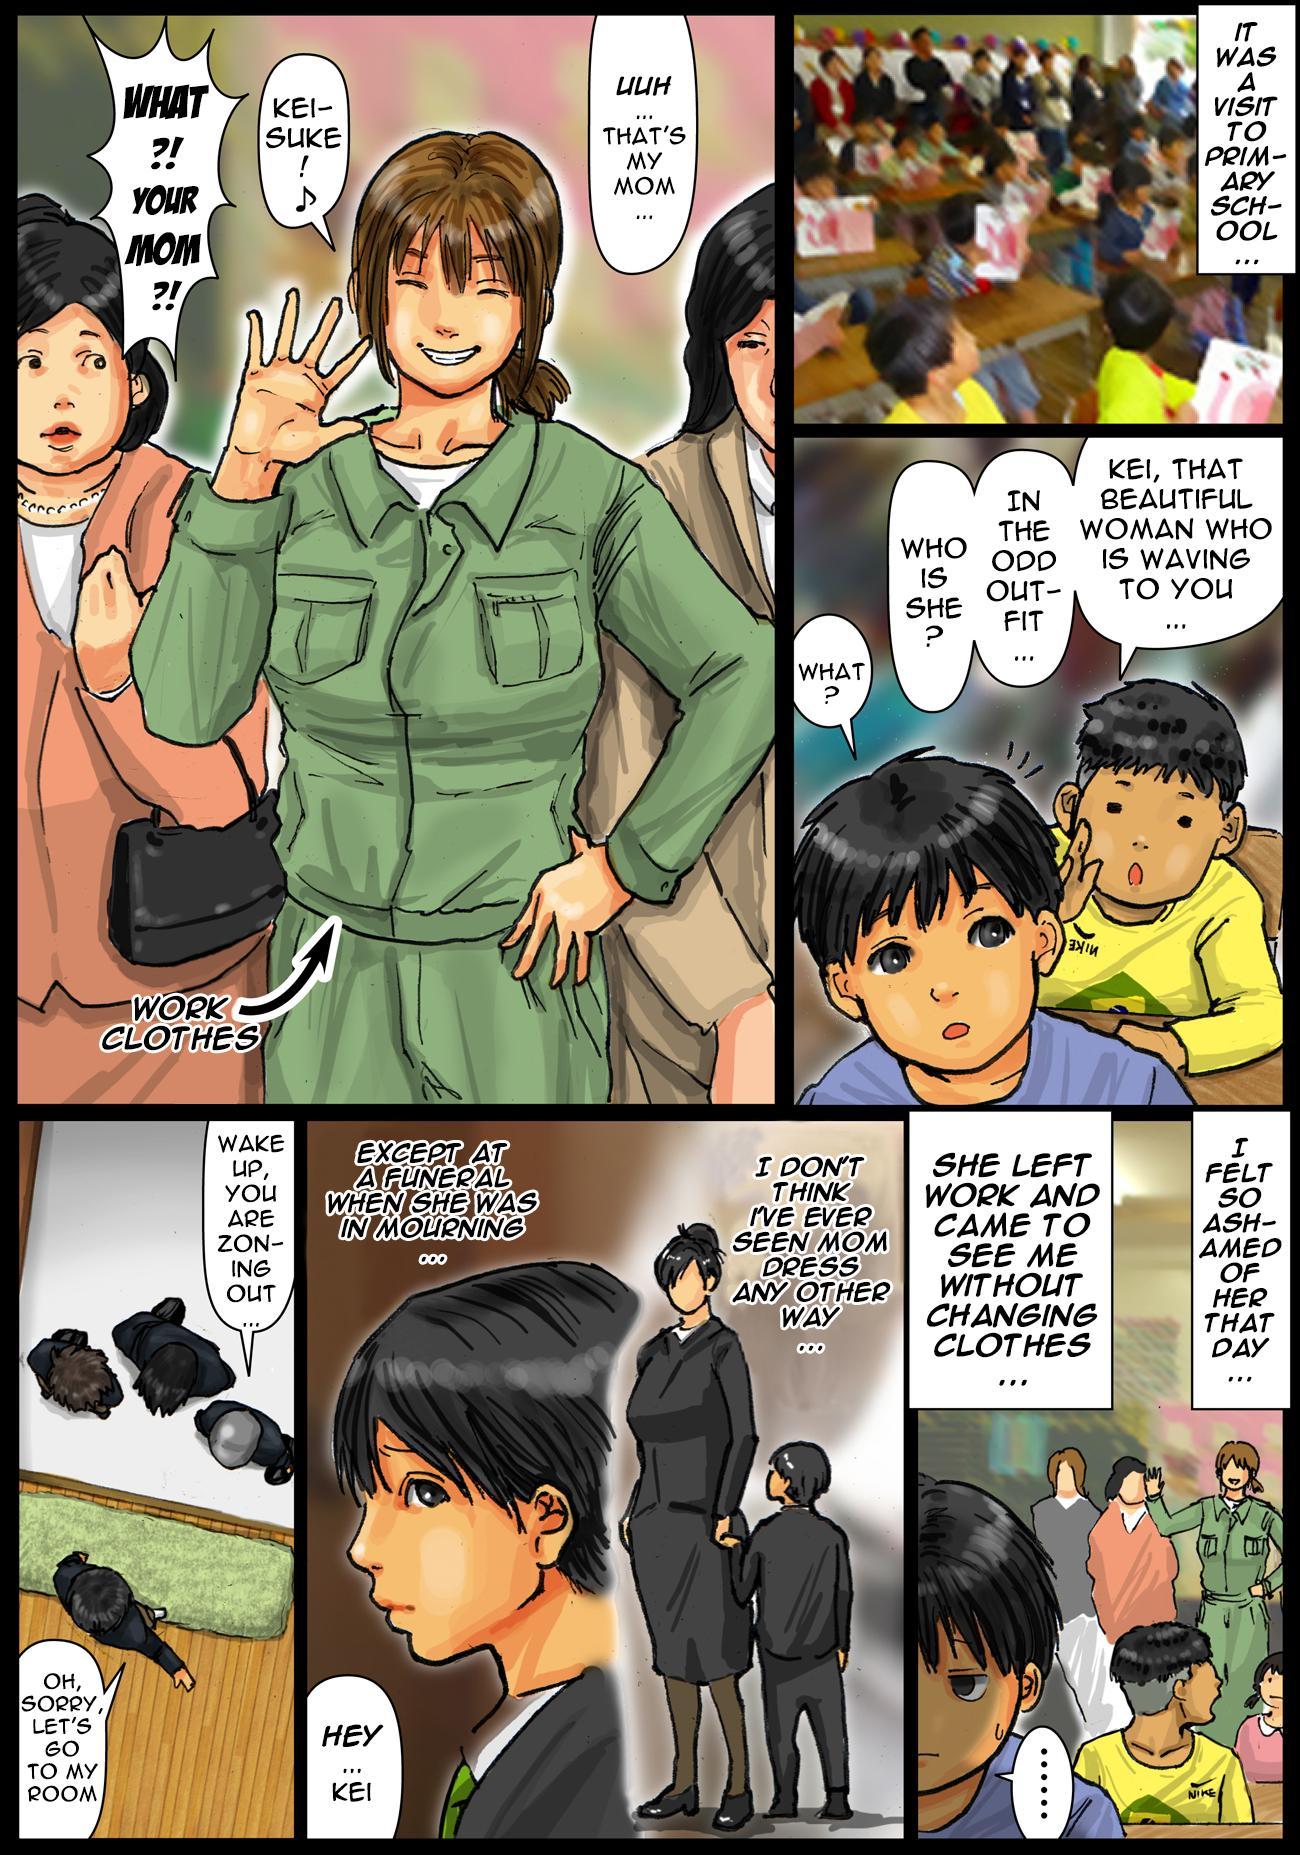 [Kuroneko Smith] Kaa-san no Ana Tsukawasete ~Zenpen~ | Cumming Inside Mommy's Hole 1 [English] [MonaS] [Digital] 14